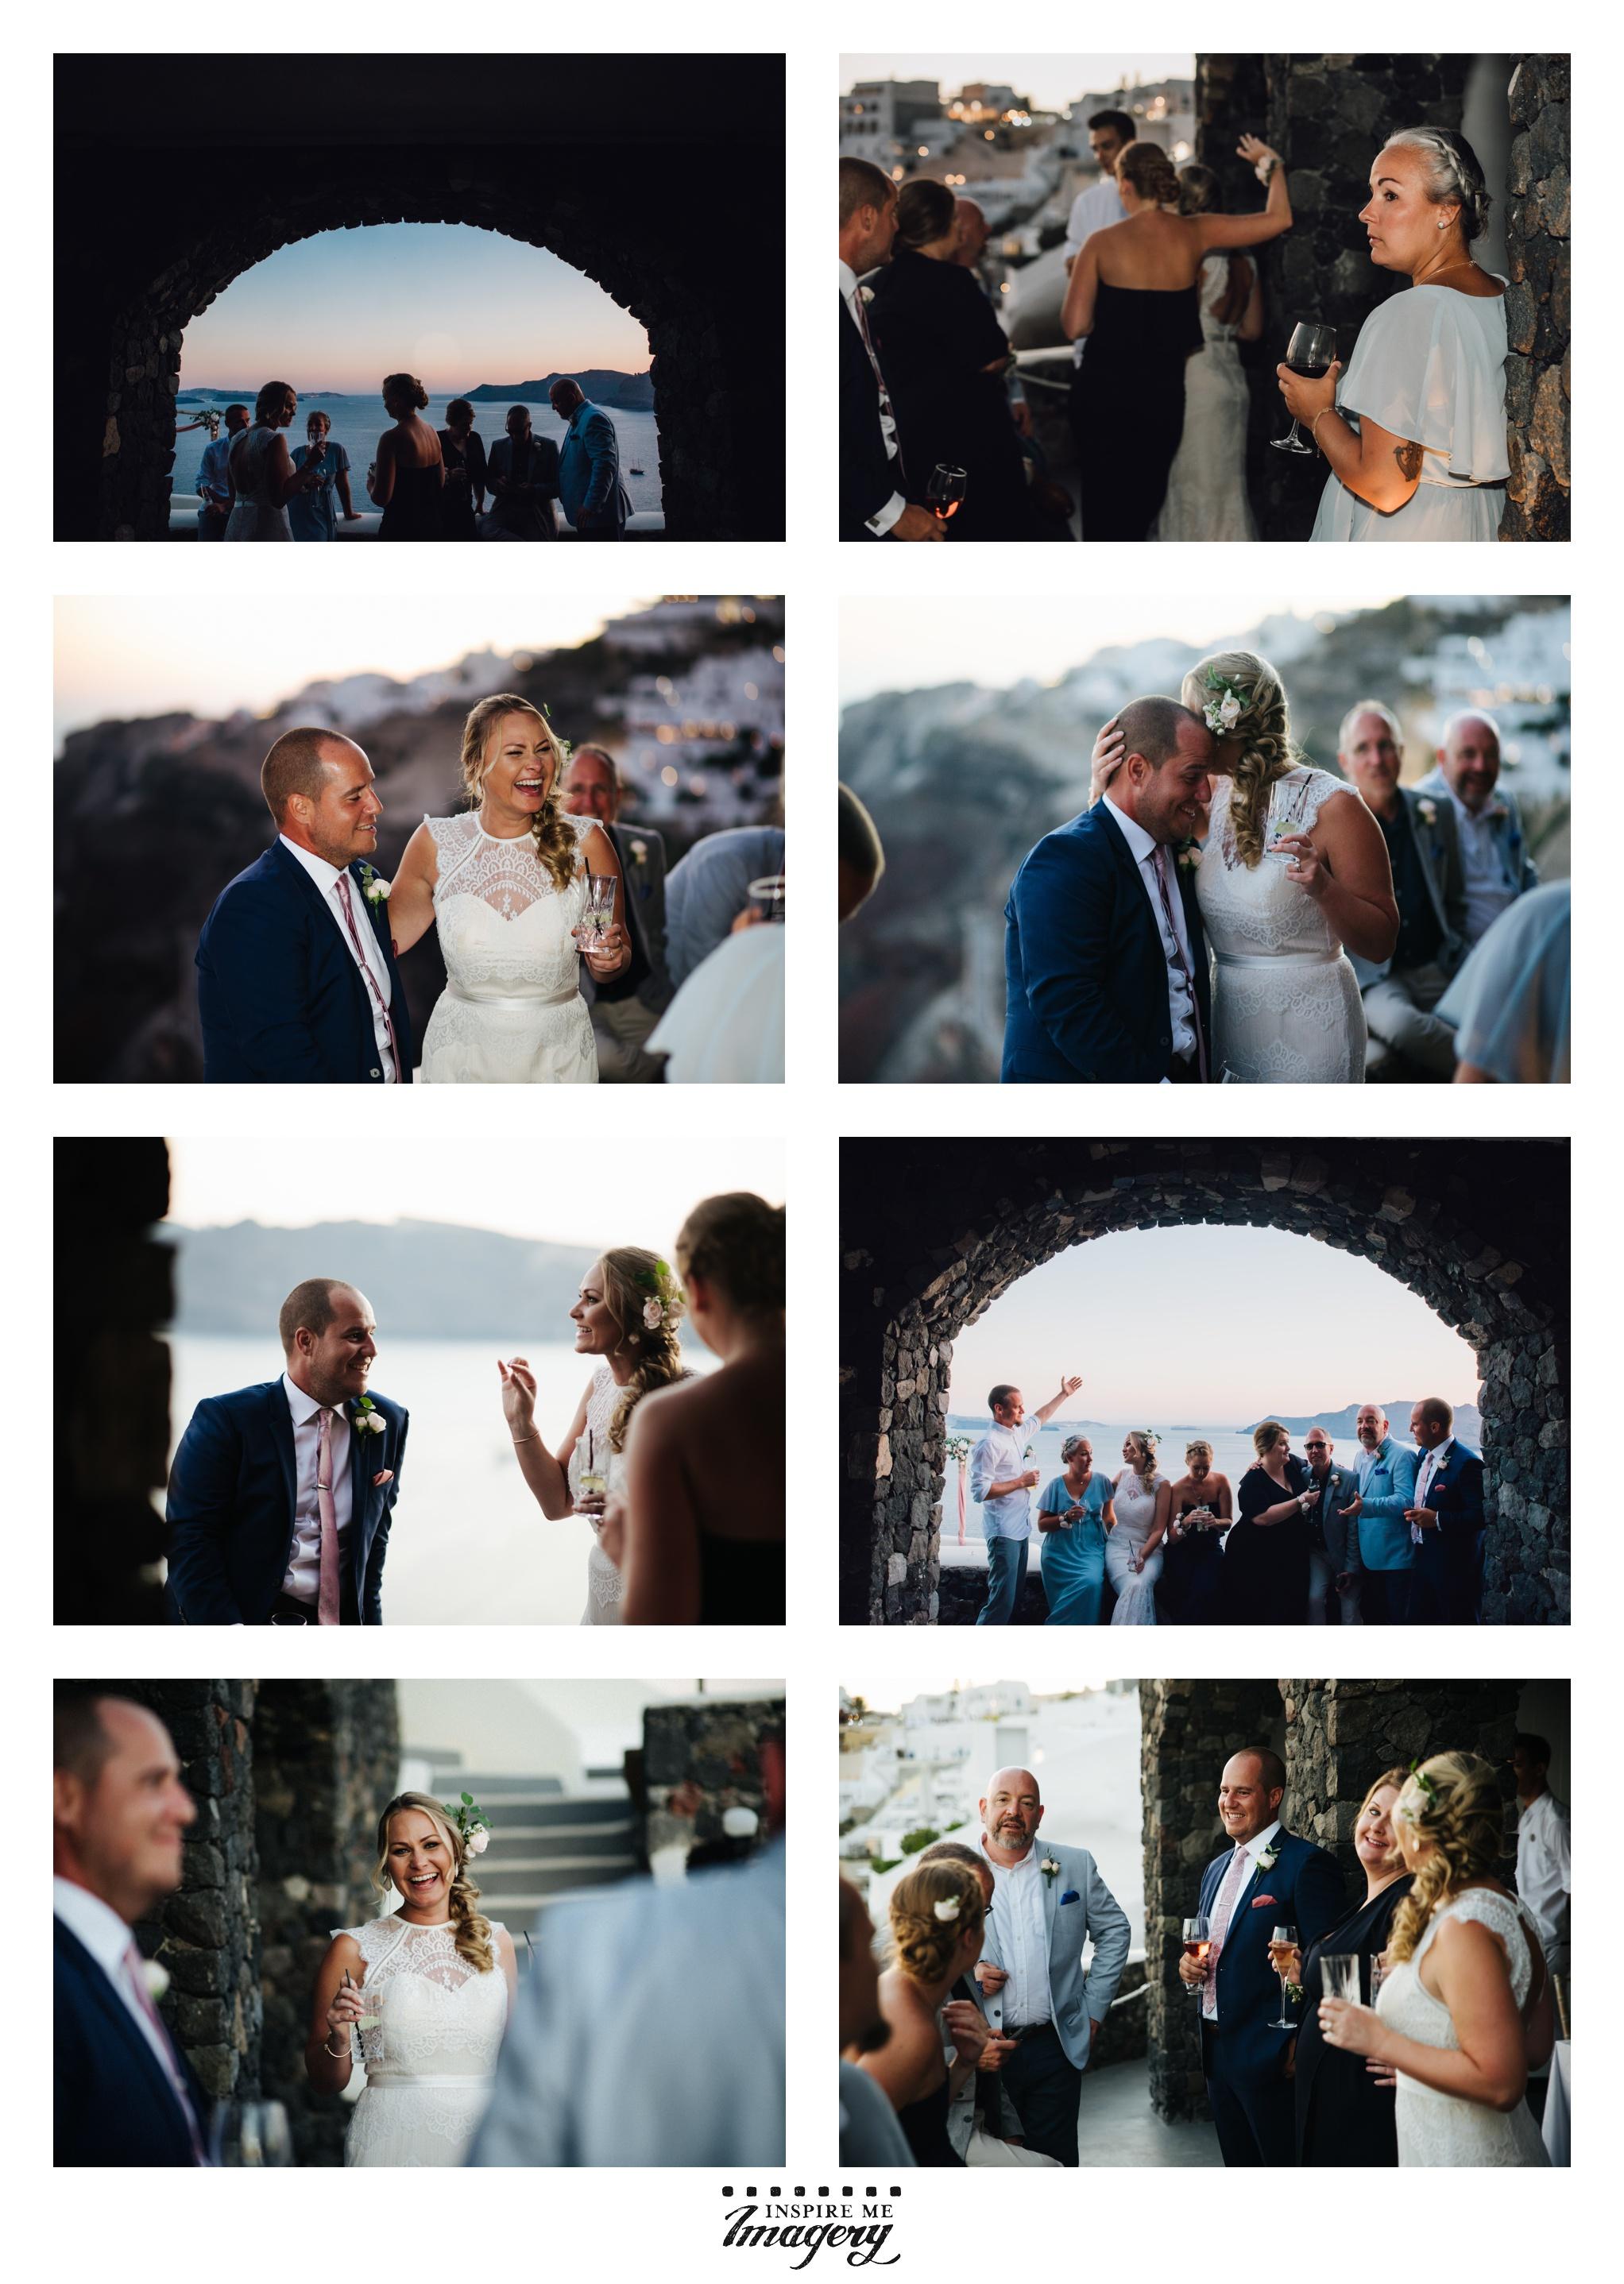 Greece-Santorini-Destination-Wedding-Photography33.jpg